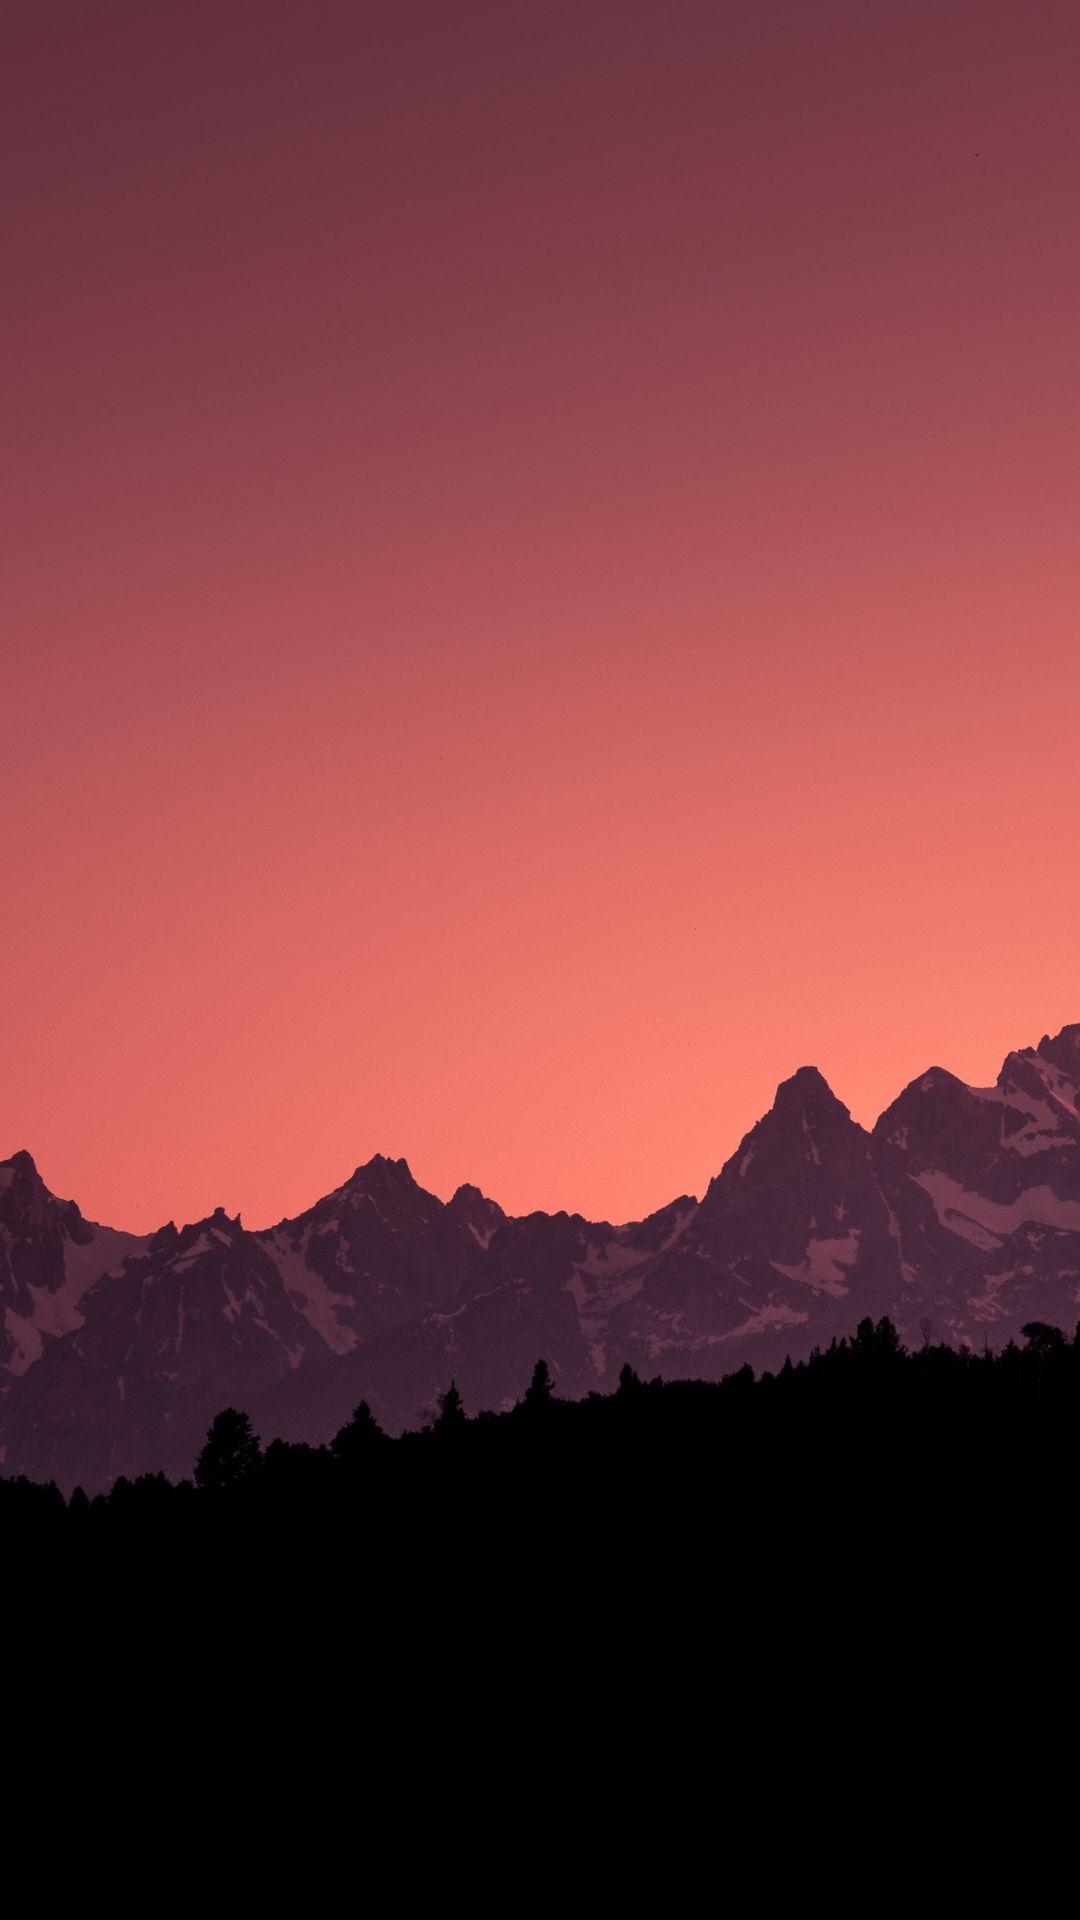 Horizon Grand Teton National Park Mountains Clean Skyline Sunset 1080x1920 Wal Iphone Wallpaper Mountains Landscape Wallpaper Backgrounds Phone Wallpapers